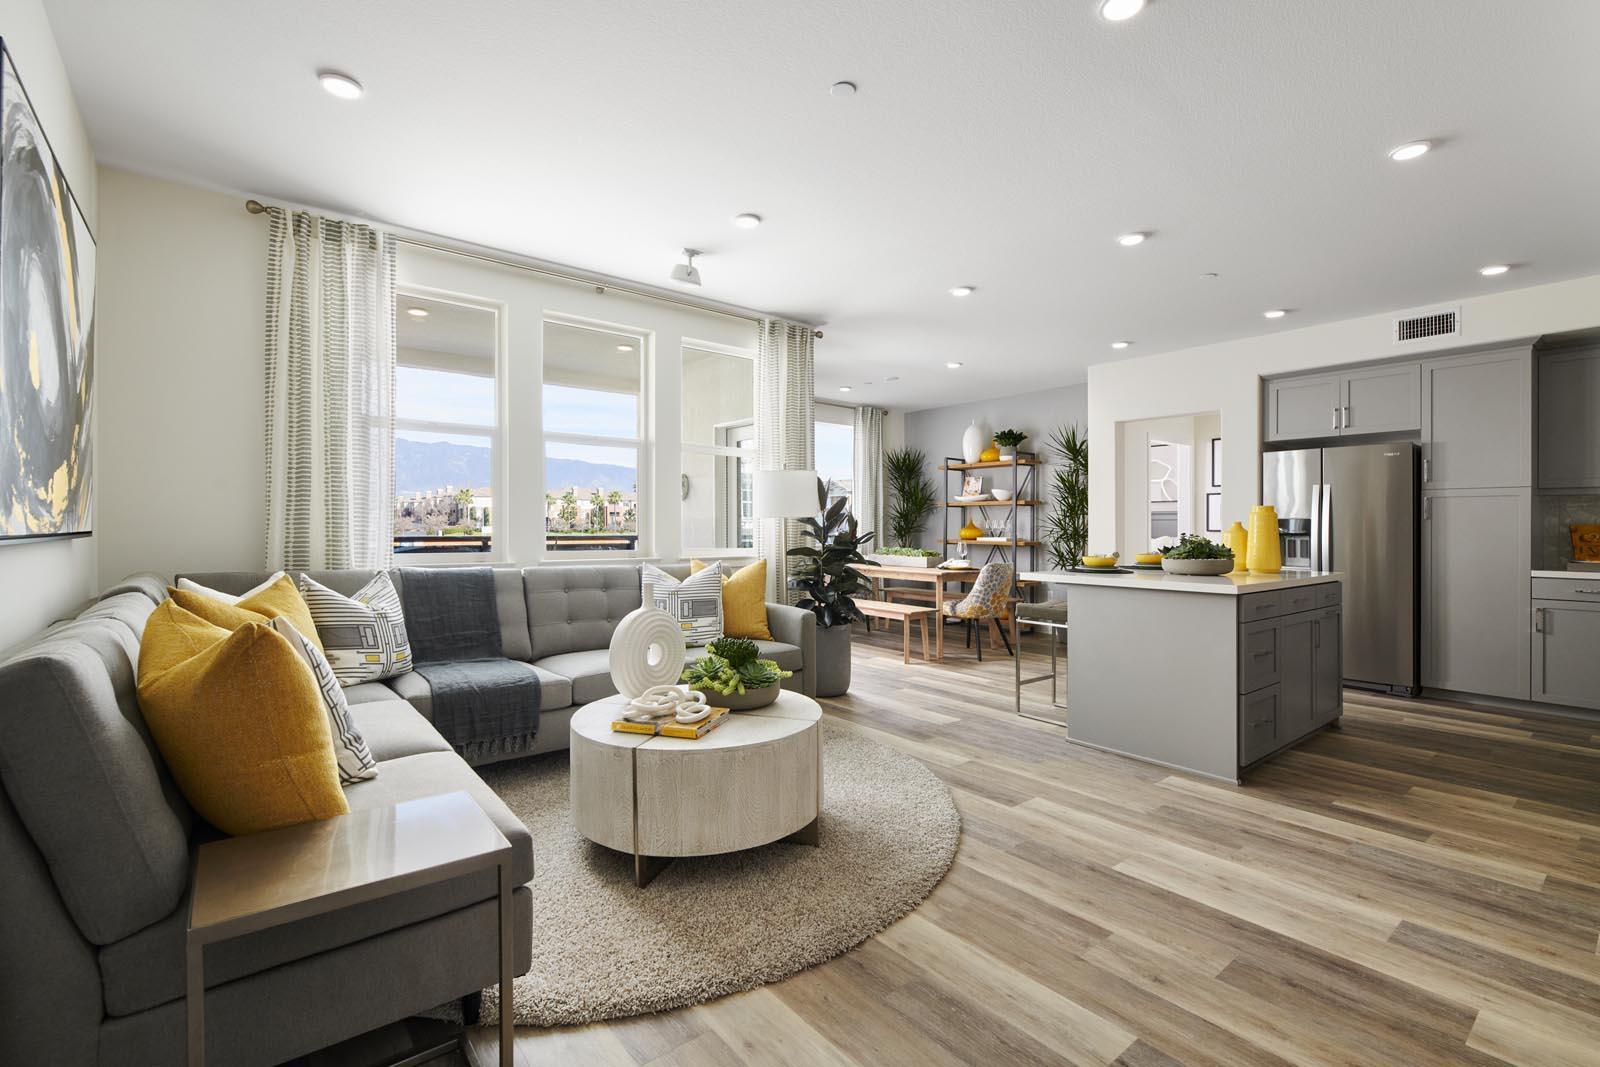 Great Room   Residence 1   Aspire   New Homes in Rancho Cucamonga, CA   Van Daele Homes